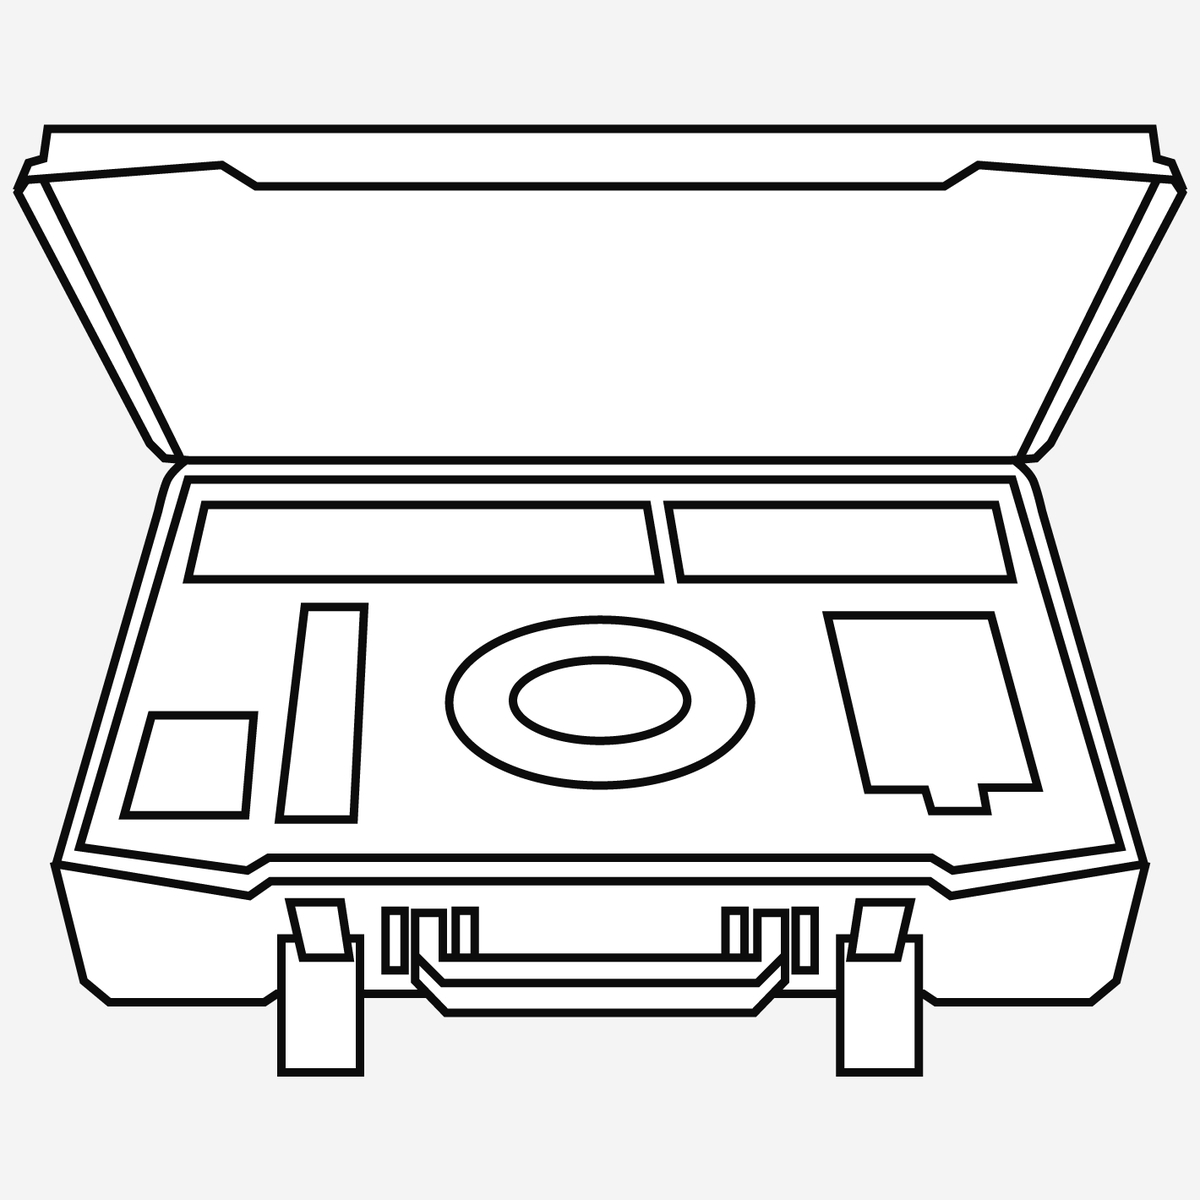 weishaupt ersatzteilkoffer wl5 b wl10 d 24005000060. Black Bedroom Furniture Sets. Home Design Ideas